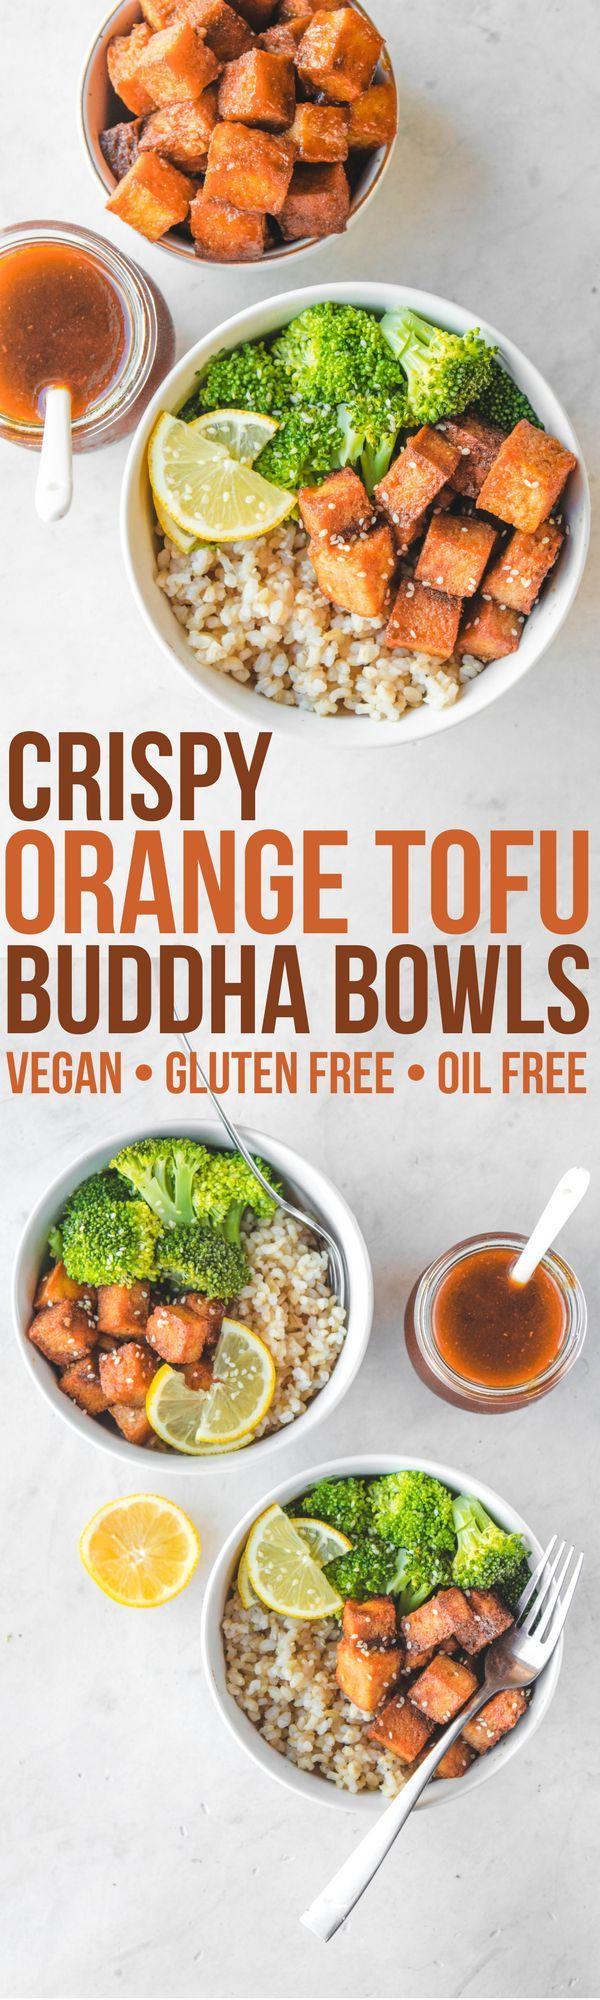 Crispy Orange Tofu Buddha Bowls (Vegan) Crispy Orange Tofu Buddha Bowls that are better than takeout! Vegan, Gluten Free, and perfect for Meal Prep via